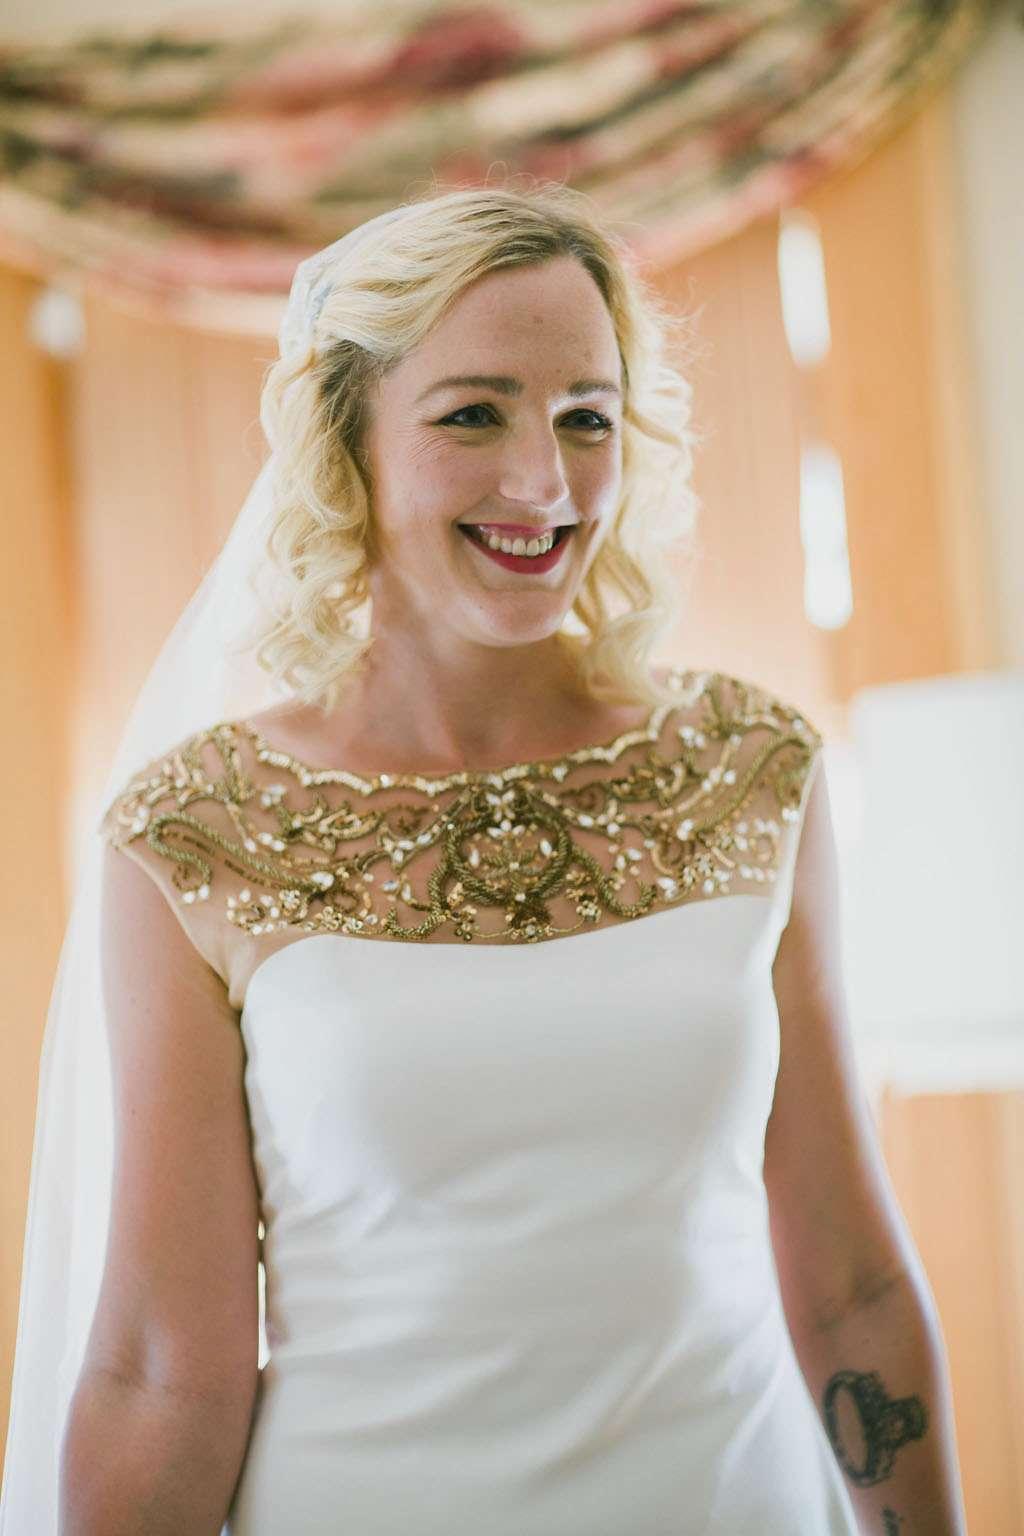 Thunder bay wedding dresses cheap wedding dresses for Cheap wedding dresses bay area